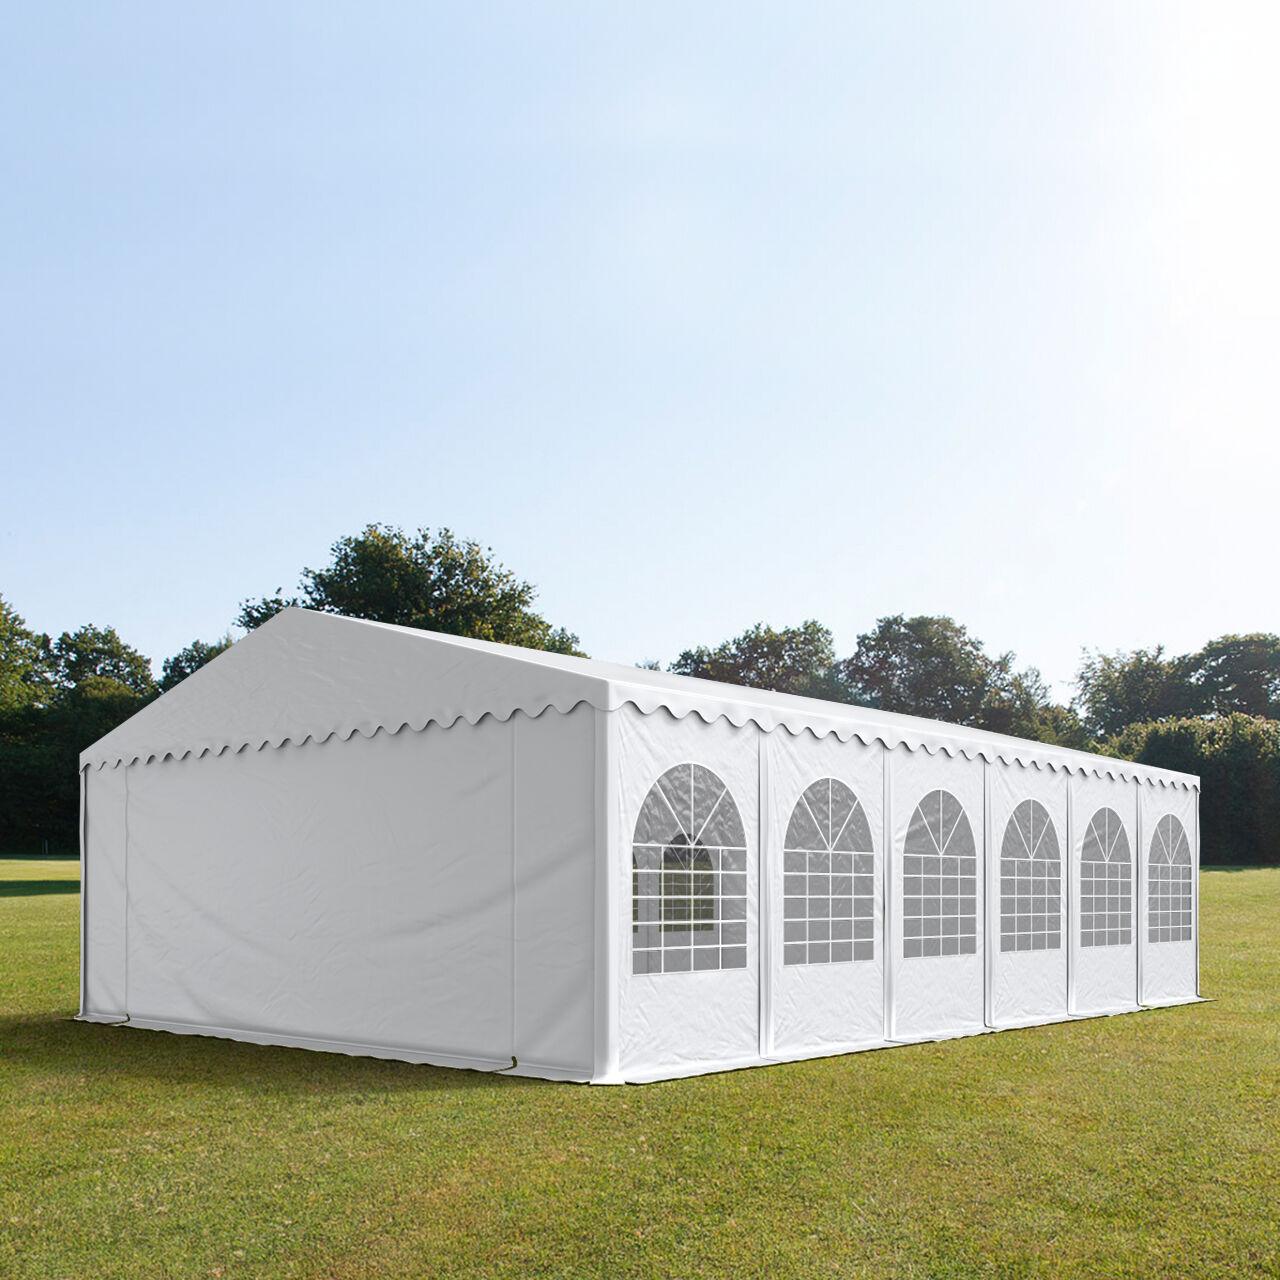 Toolport Tendone per Feste 7x12m PVC 550 g/m² bianco impermeabile